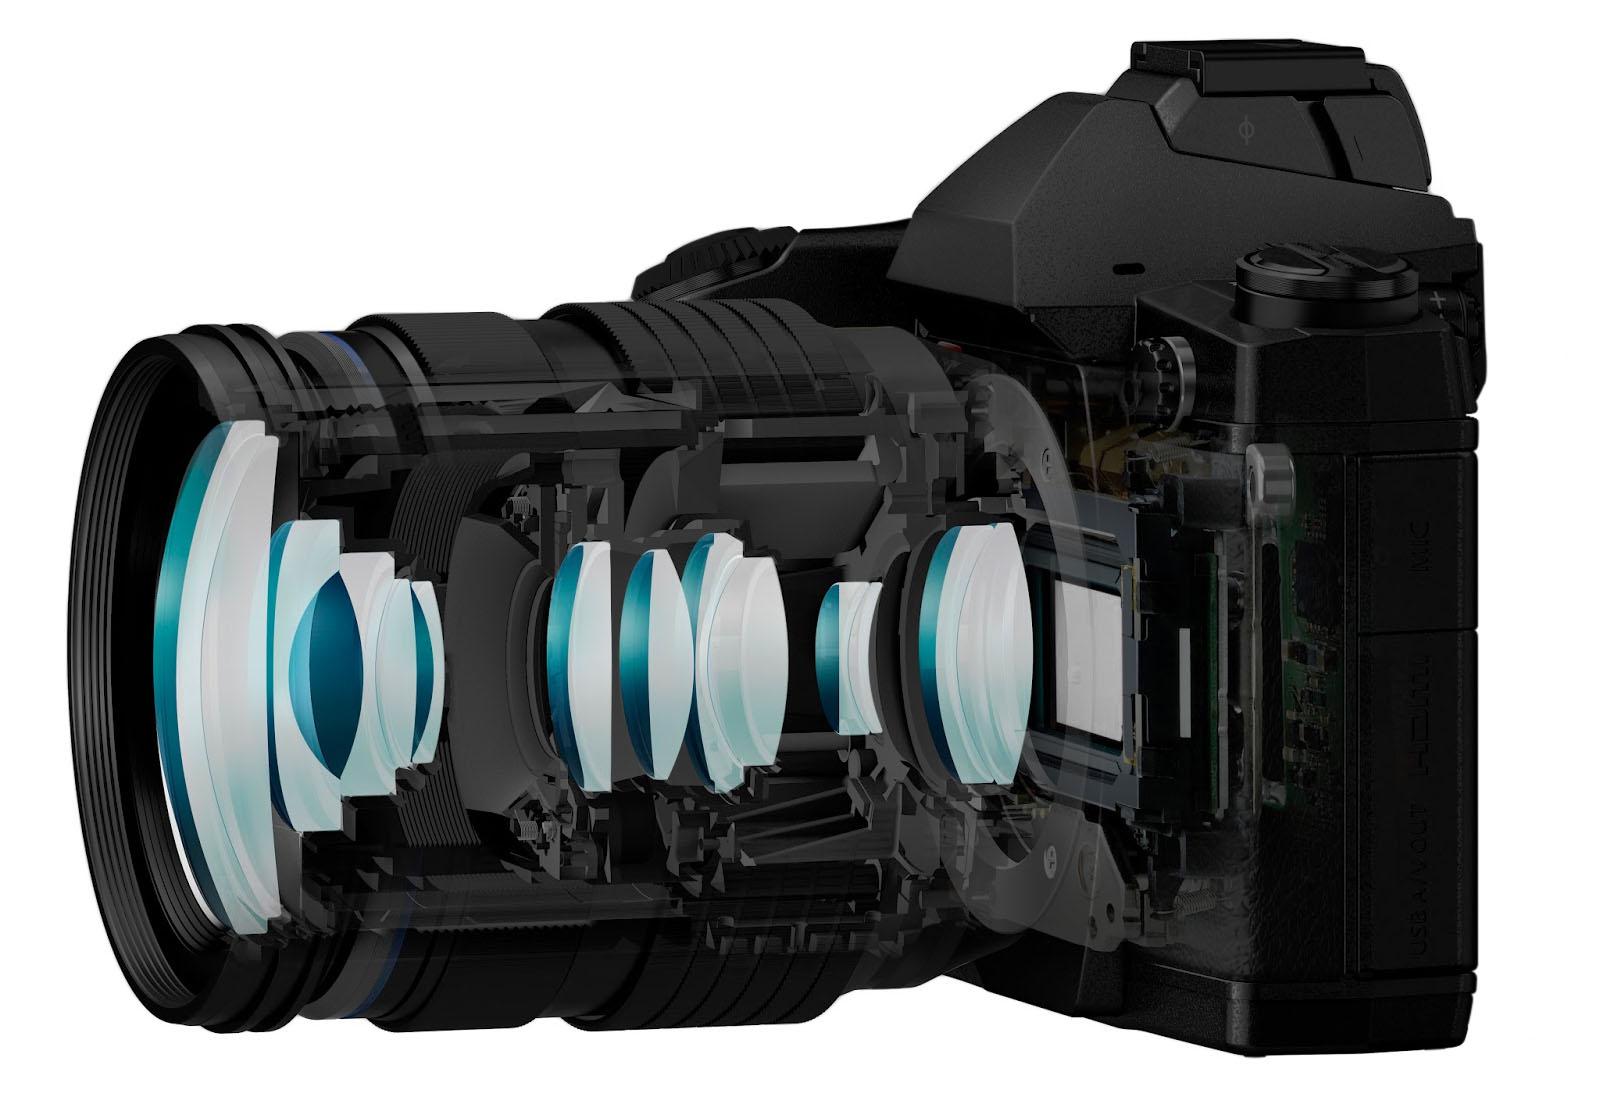 Libert² dual-lens system explained using a reflex camera